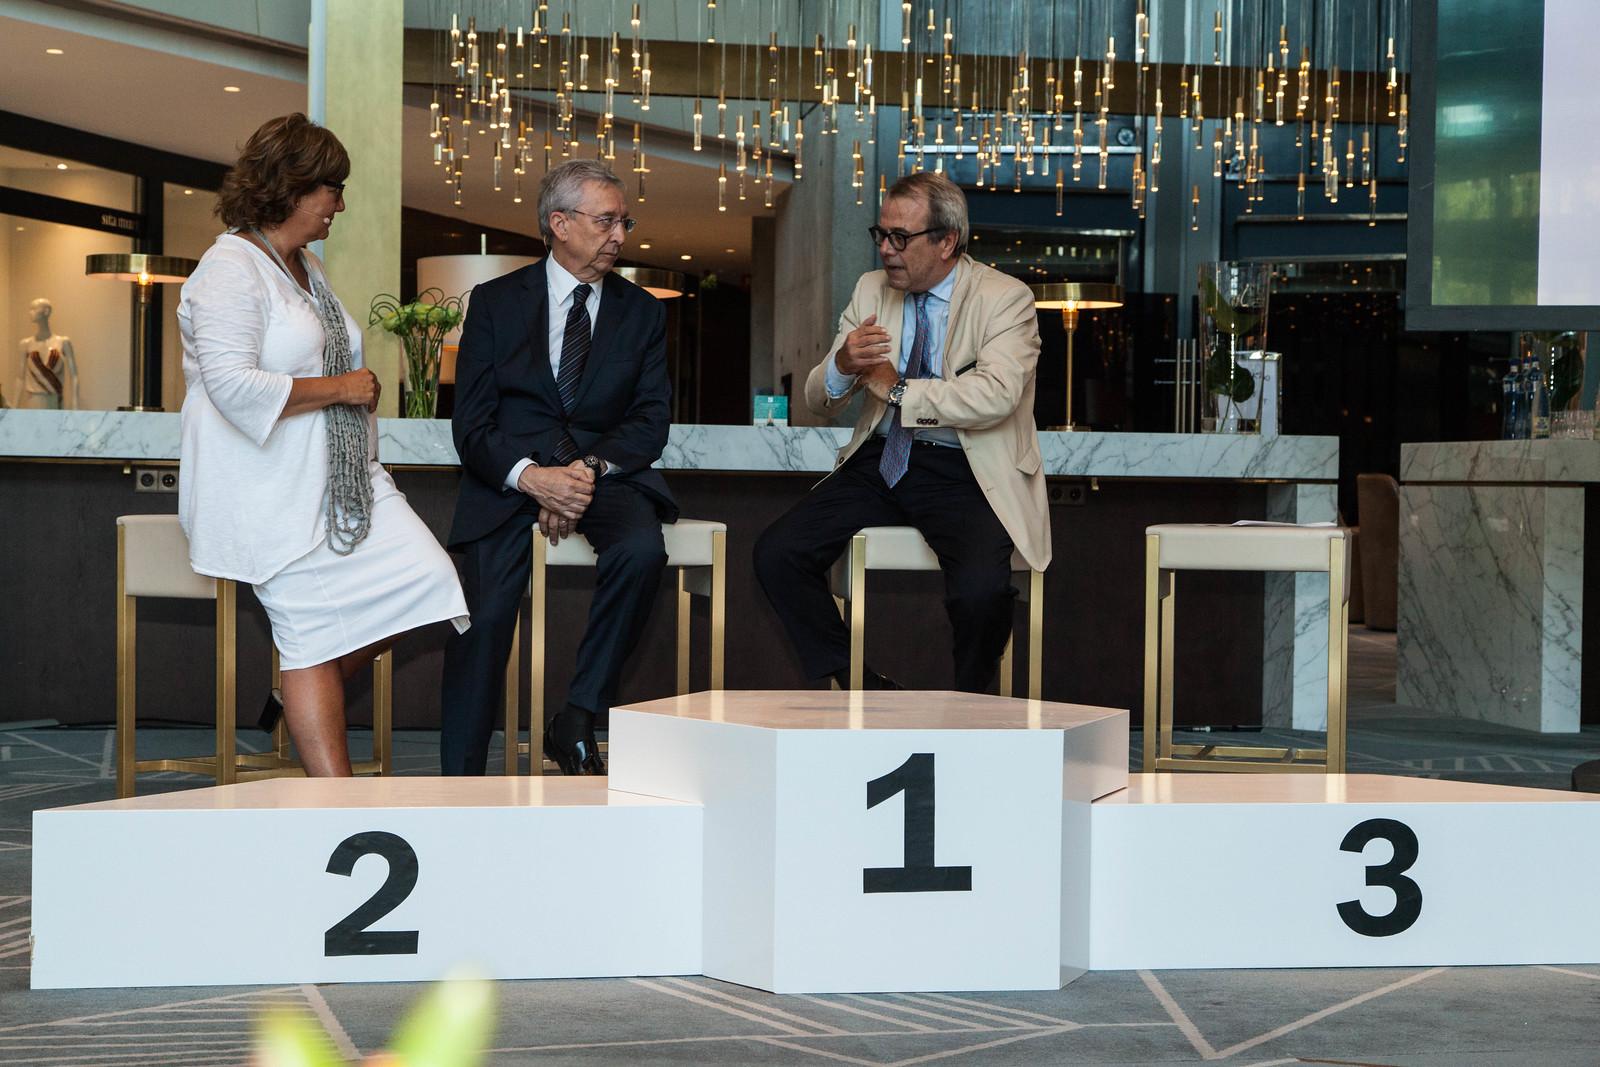 dc., 05/07/2017 - 19:47 - Hotel Rey Juan Carlos - 50